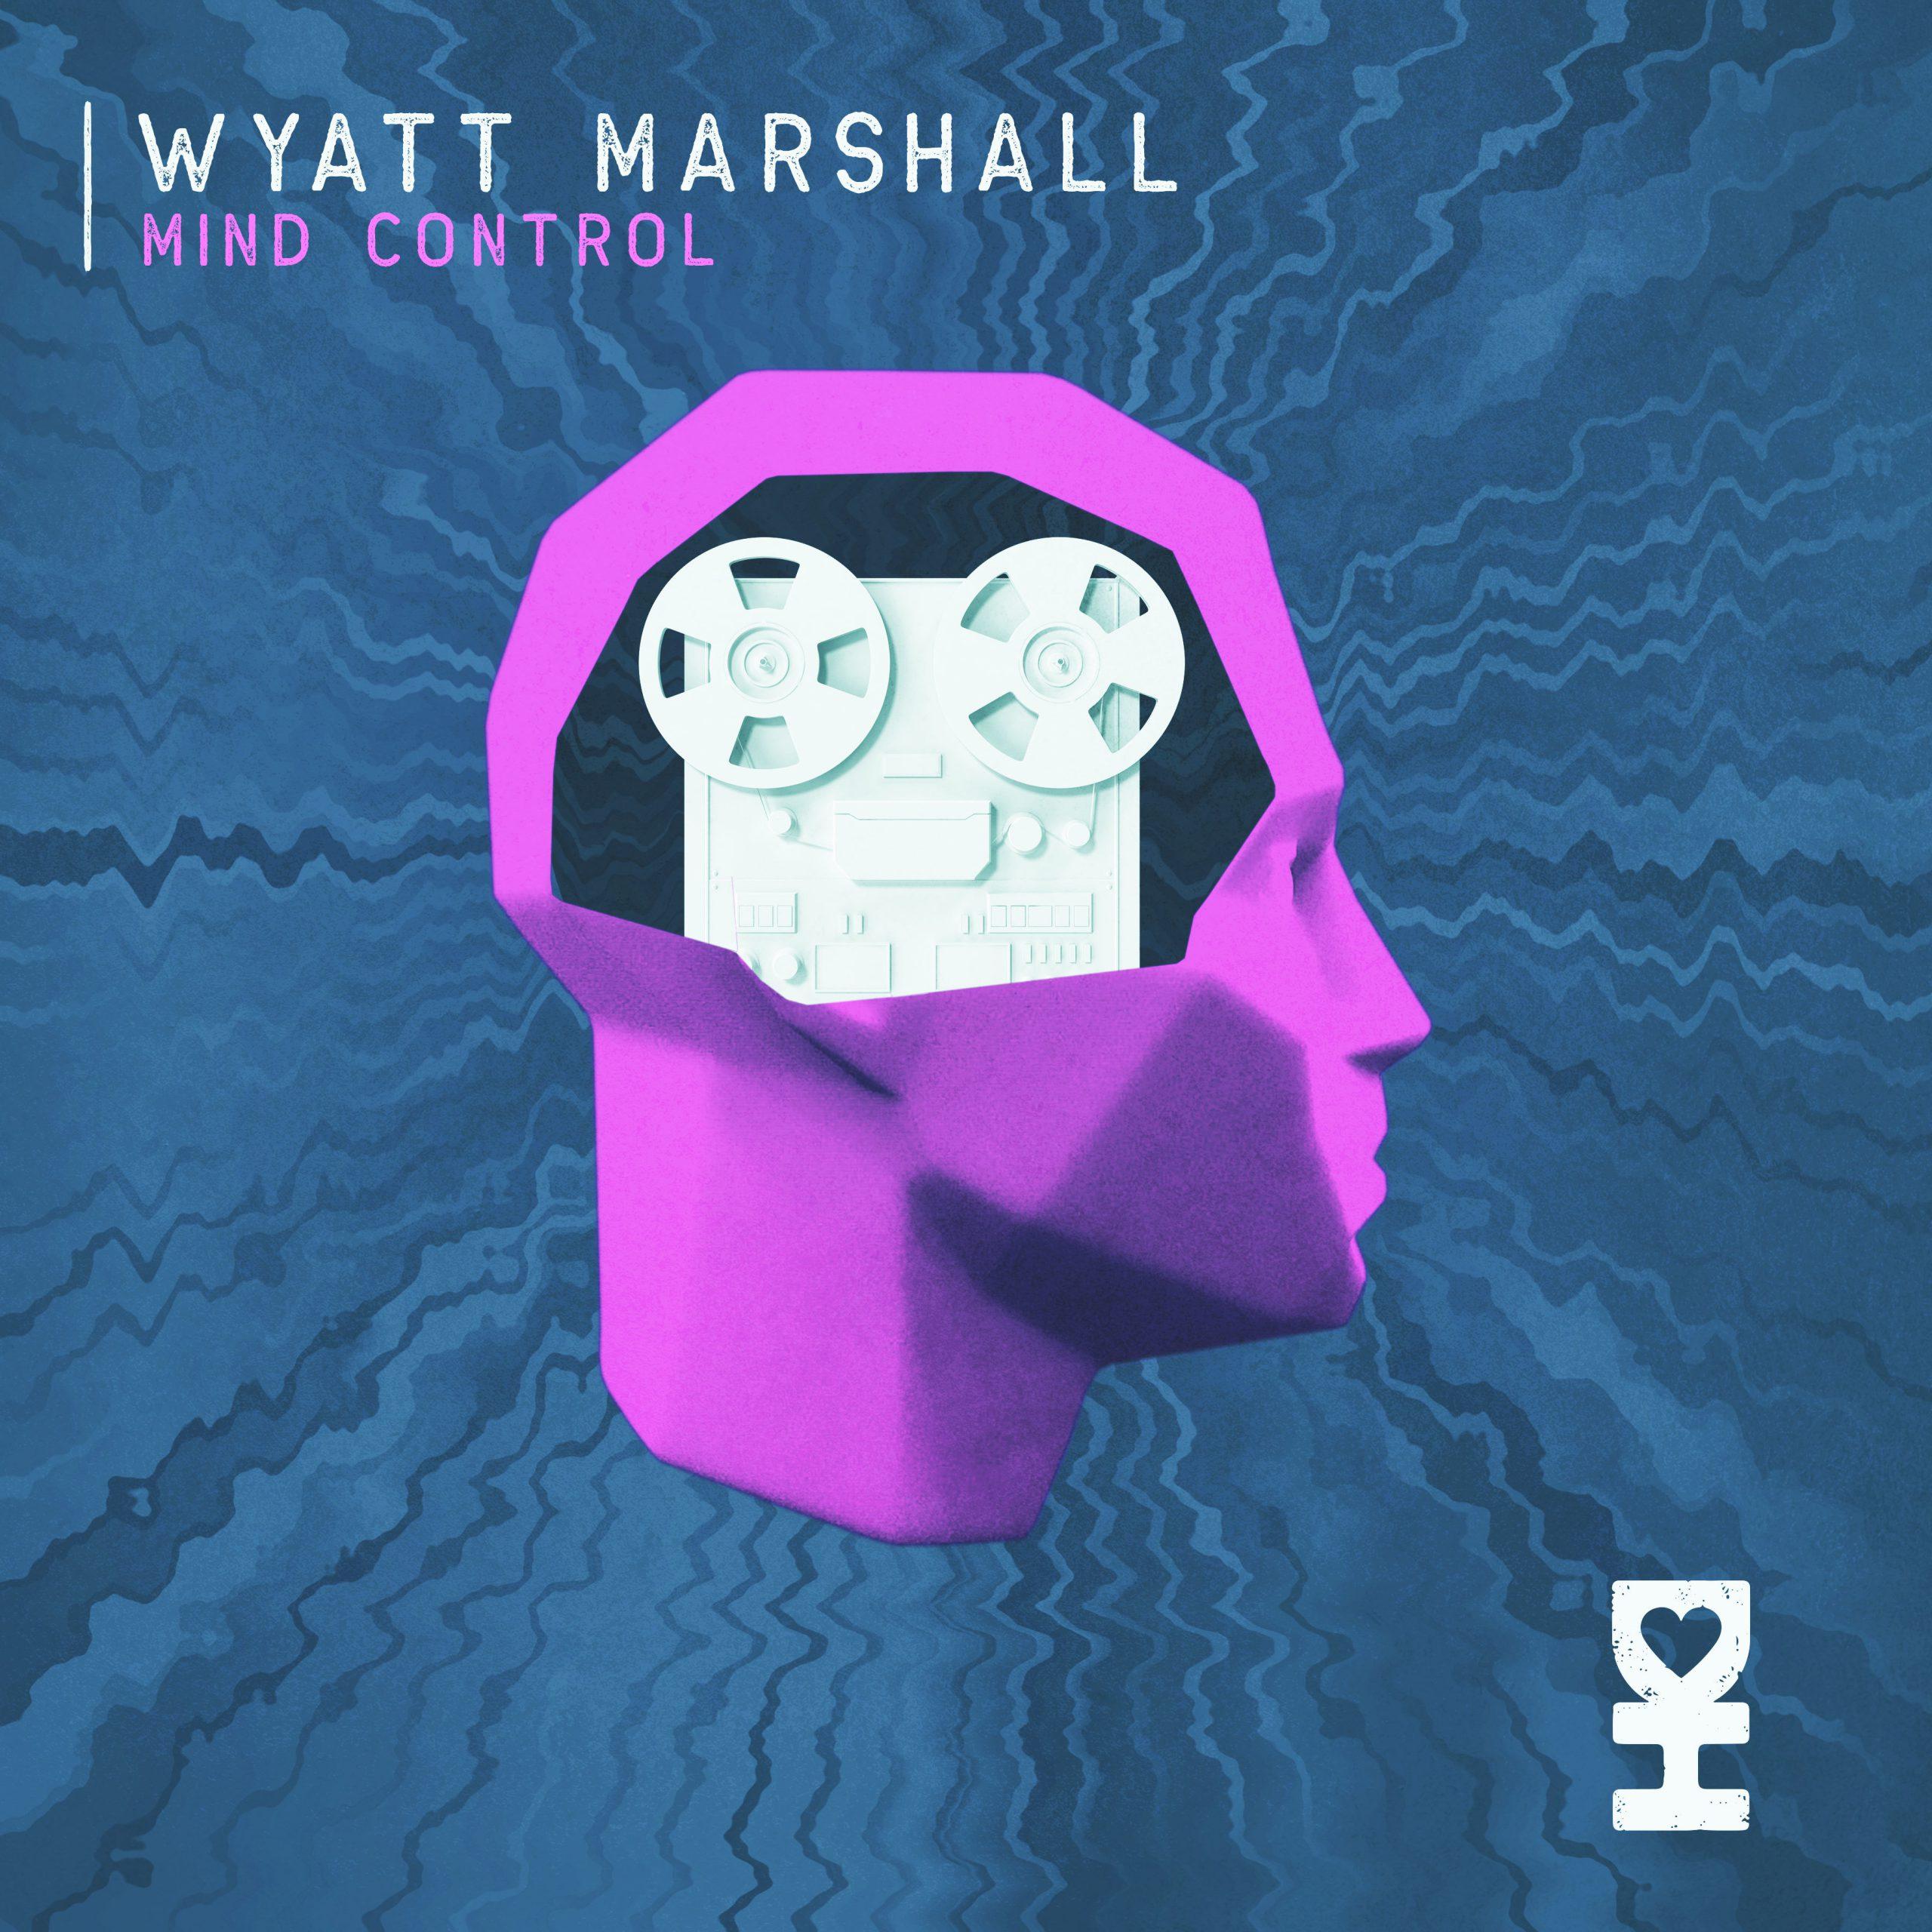 Wyatt Marshall - 'Mind Control' EP